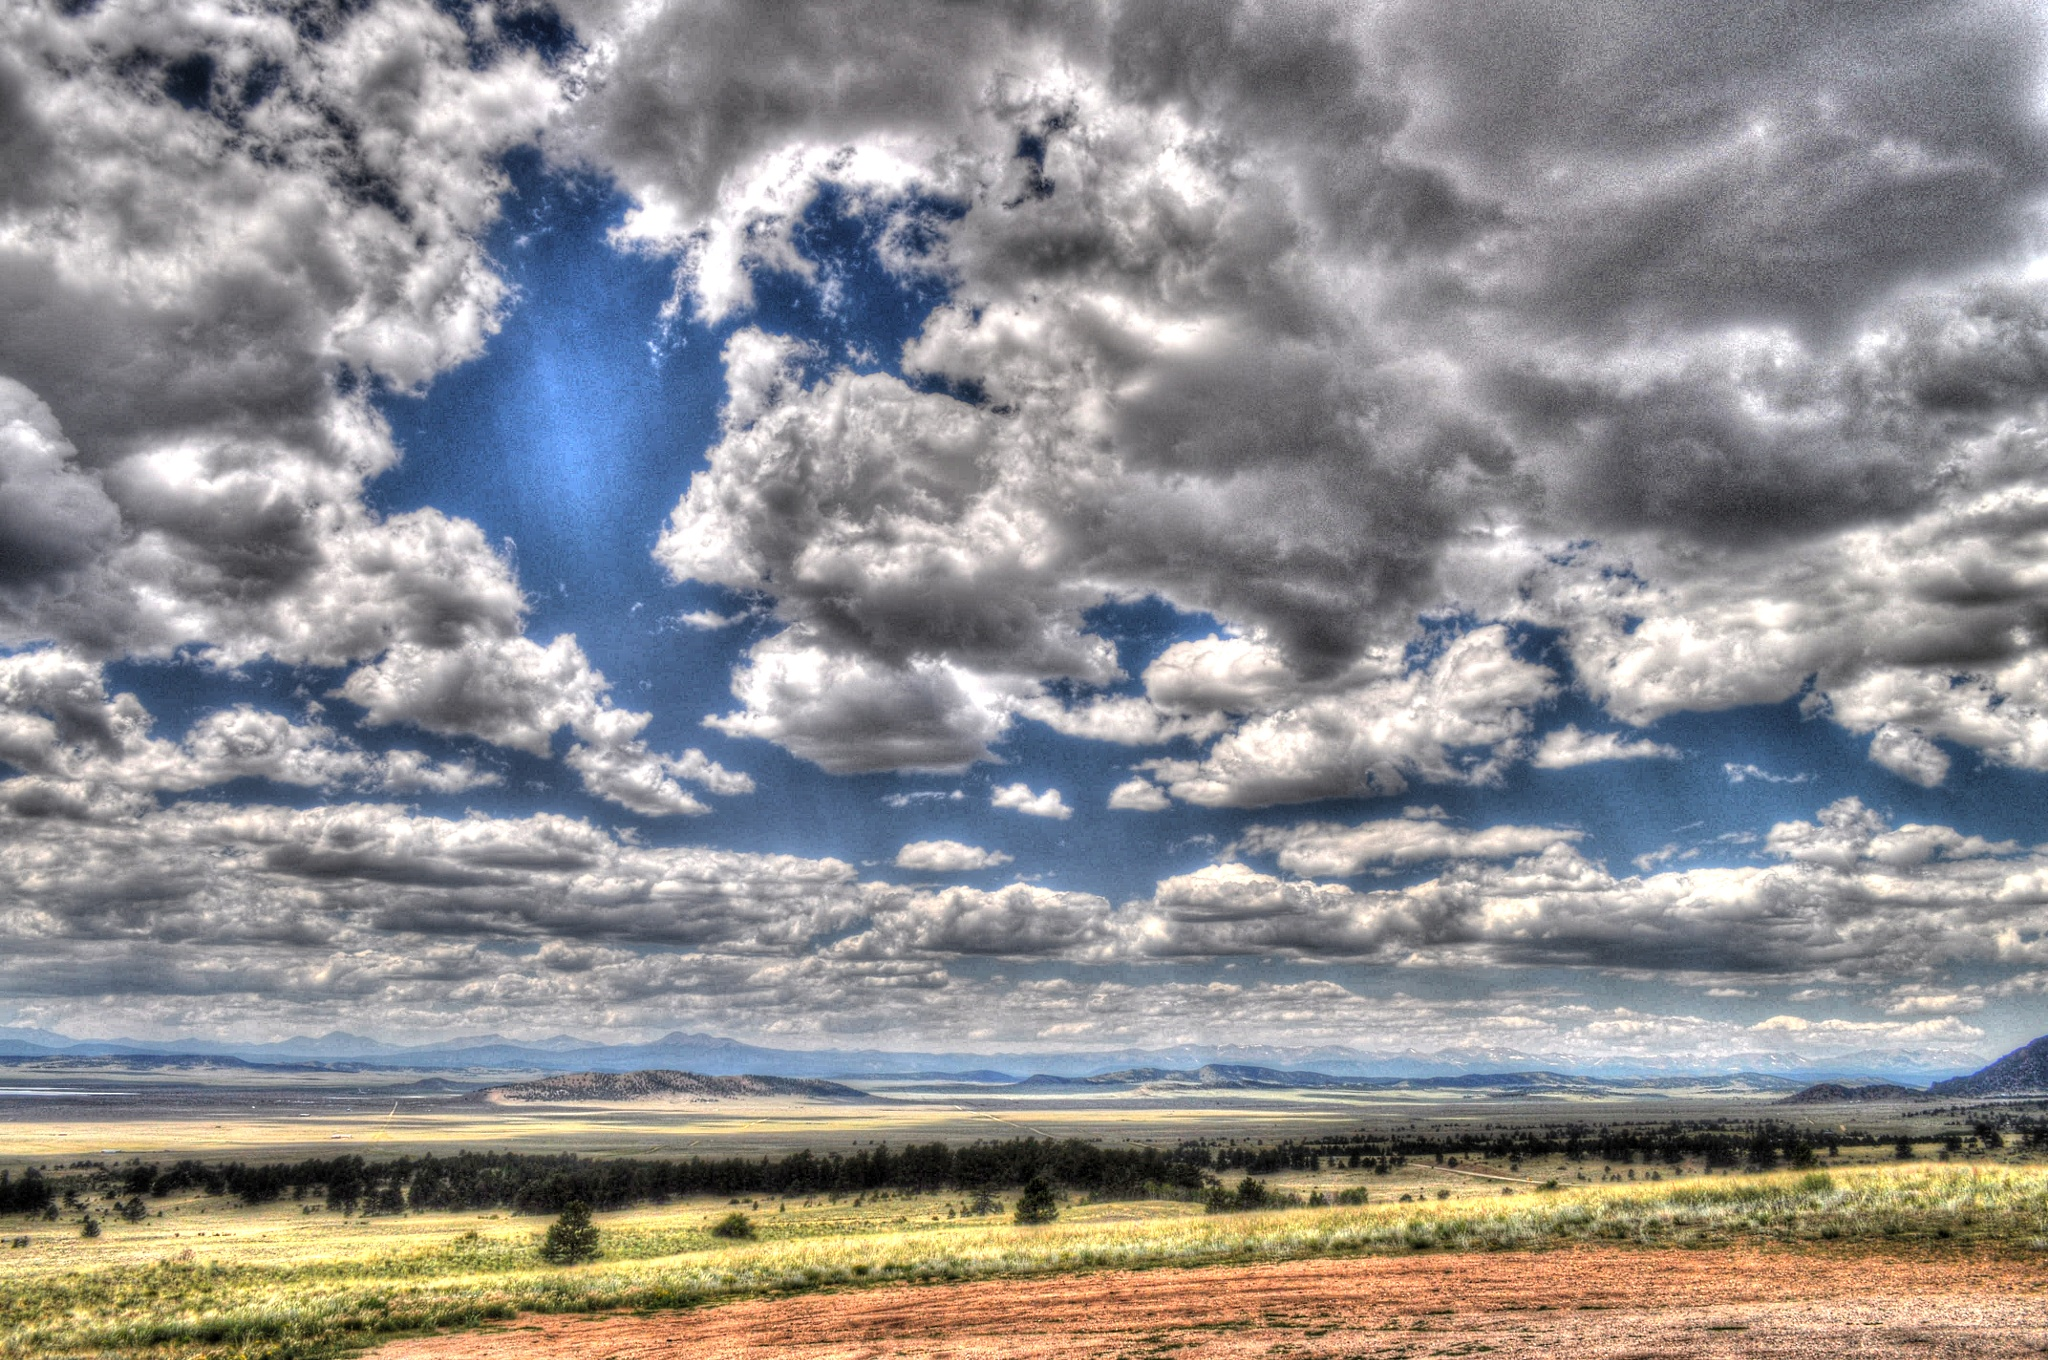 Colorado Scene 6 by Jaime Cantu